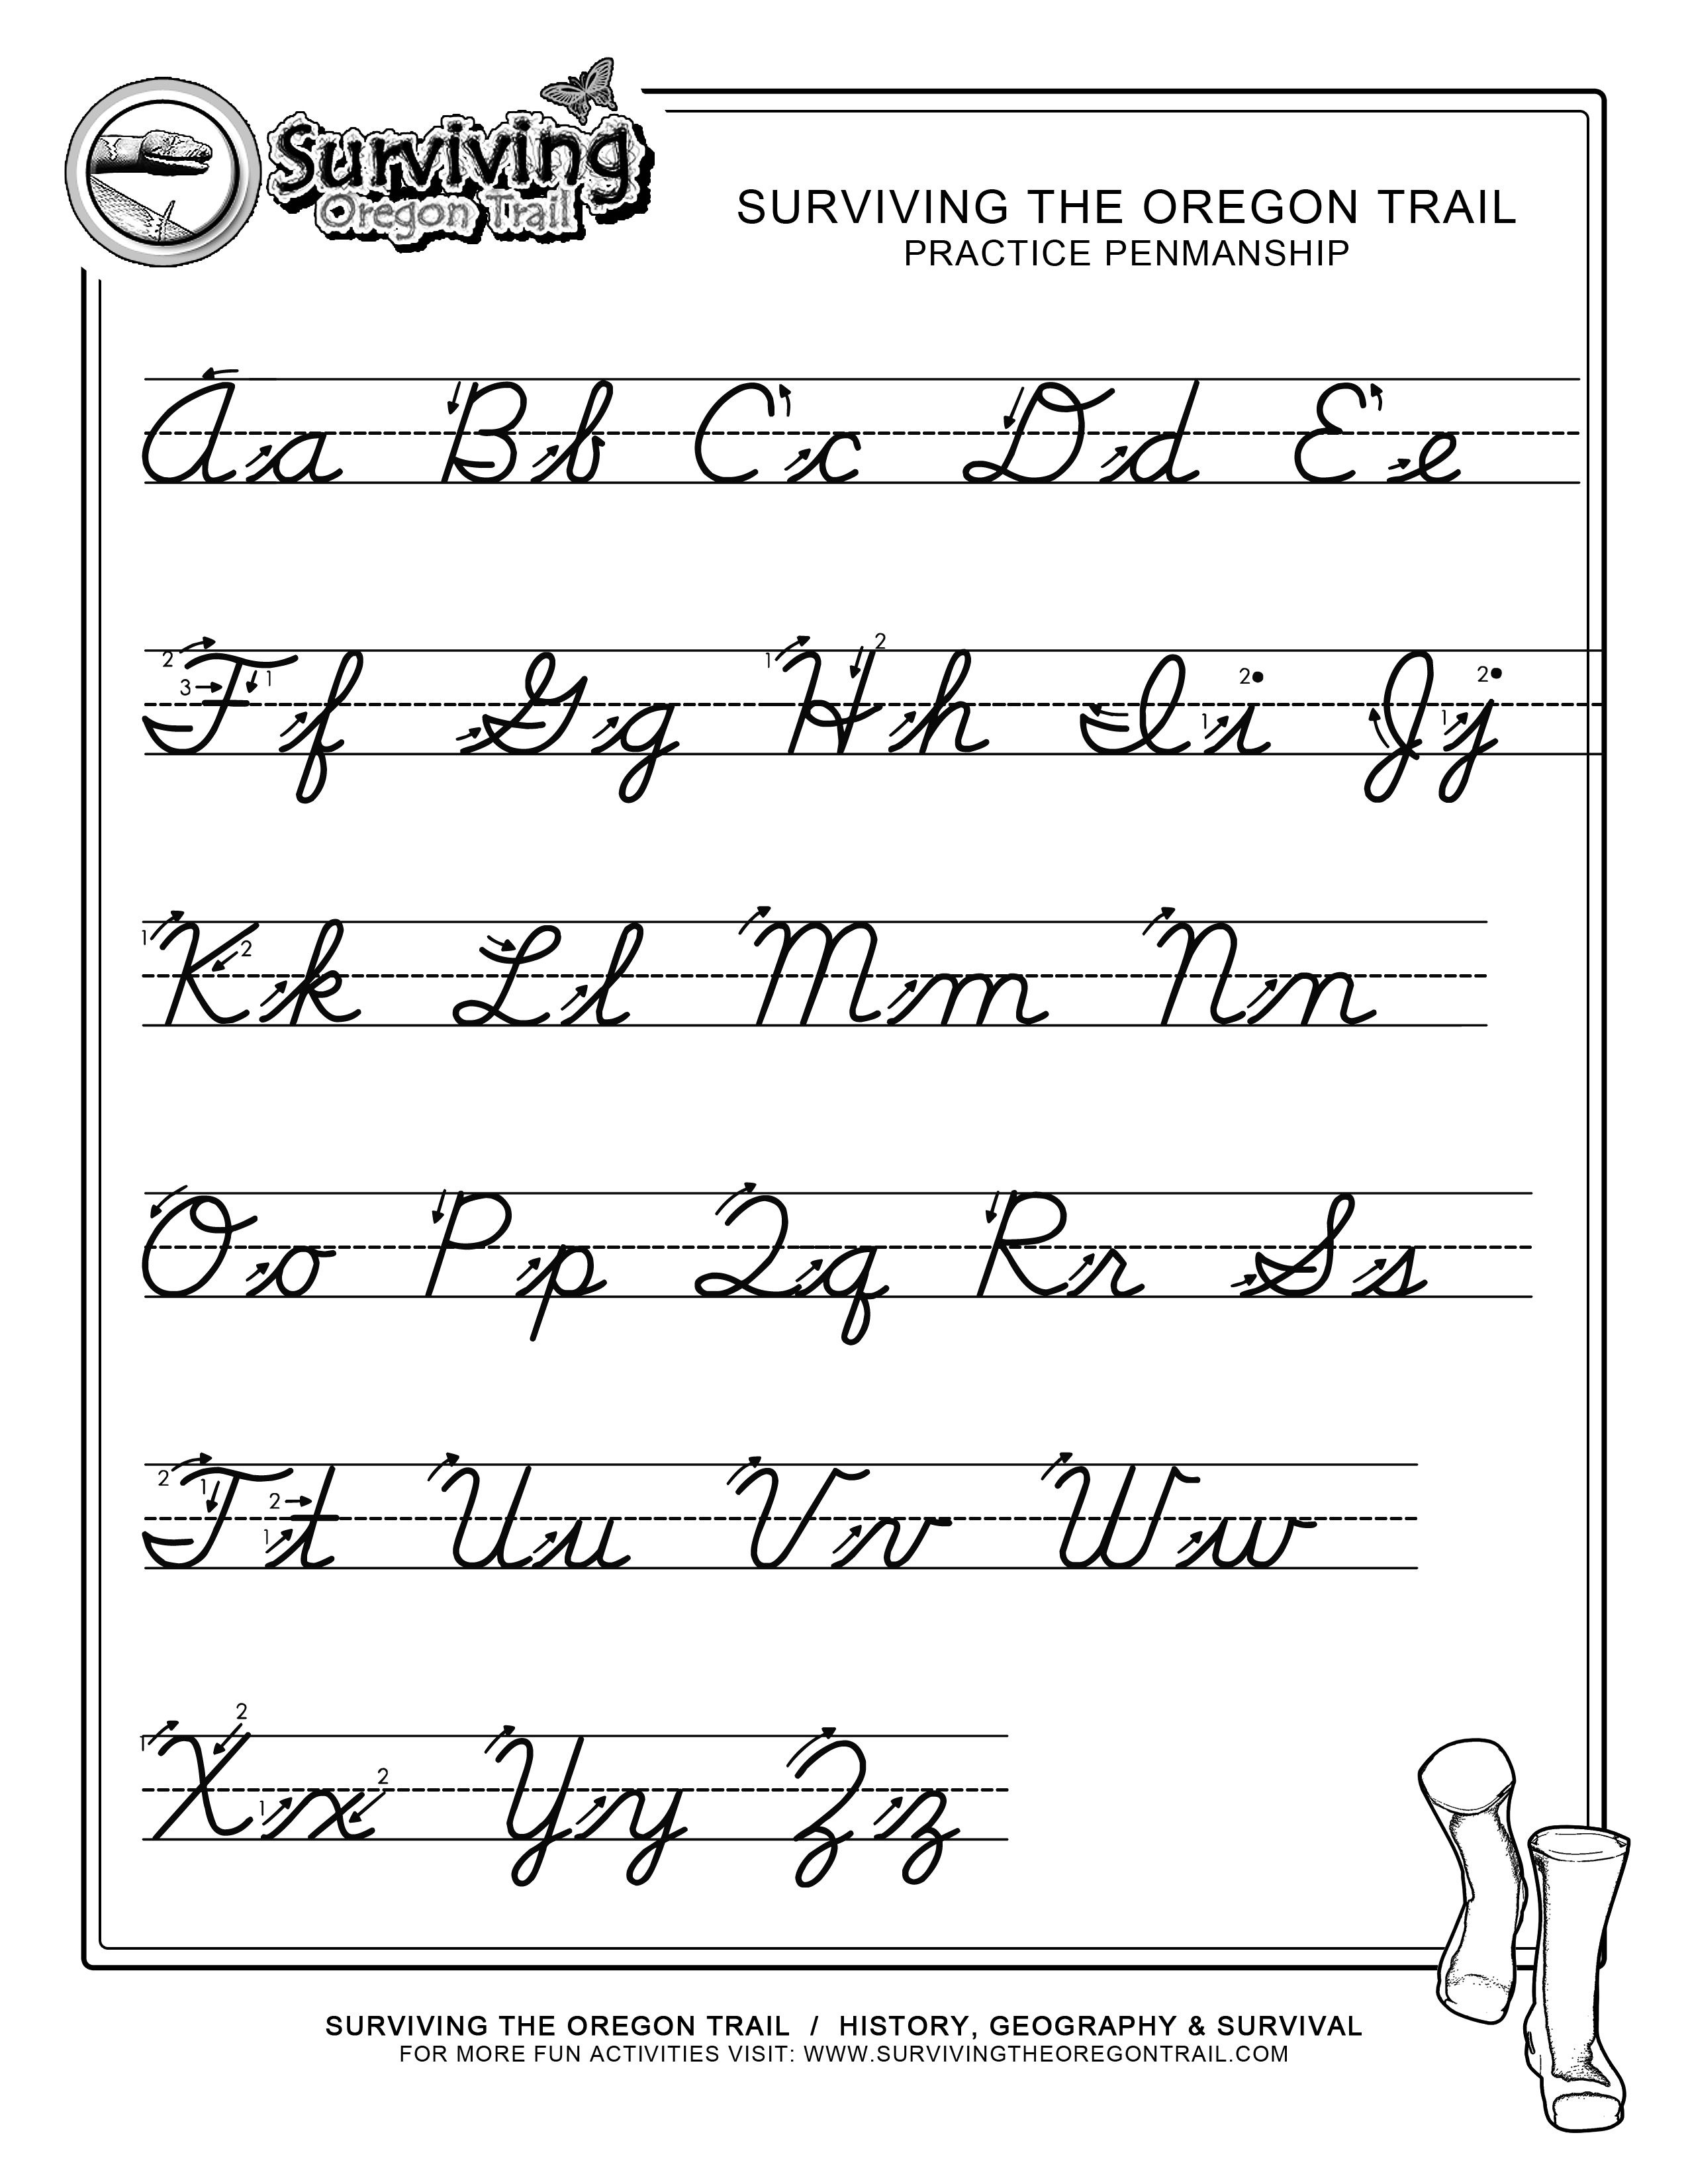 Free Print Alphabet Letter Worksheets |  – Free Abc's Printable - Free Printable Worksheets Handwriting Practice